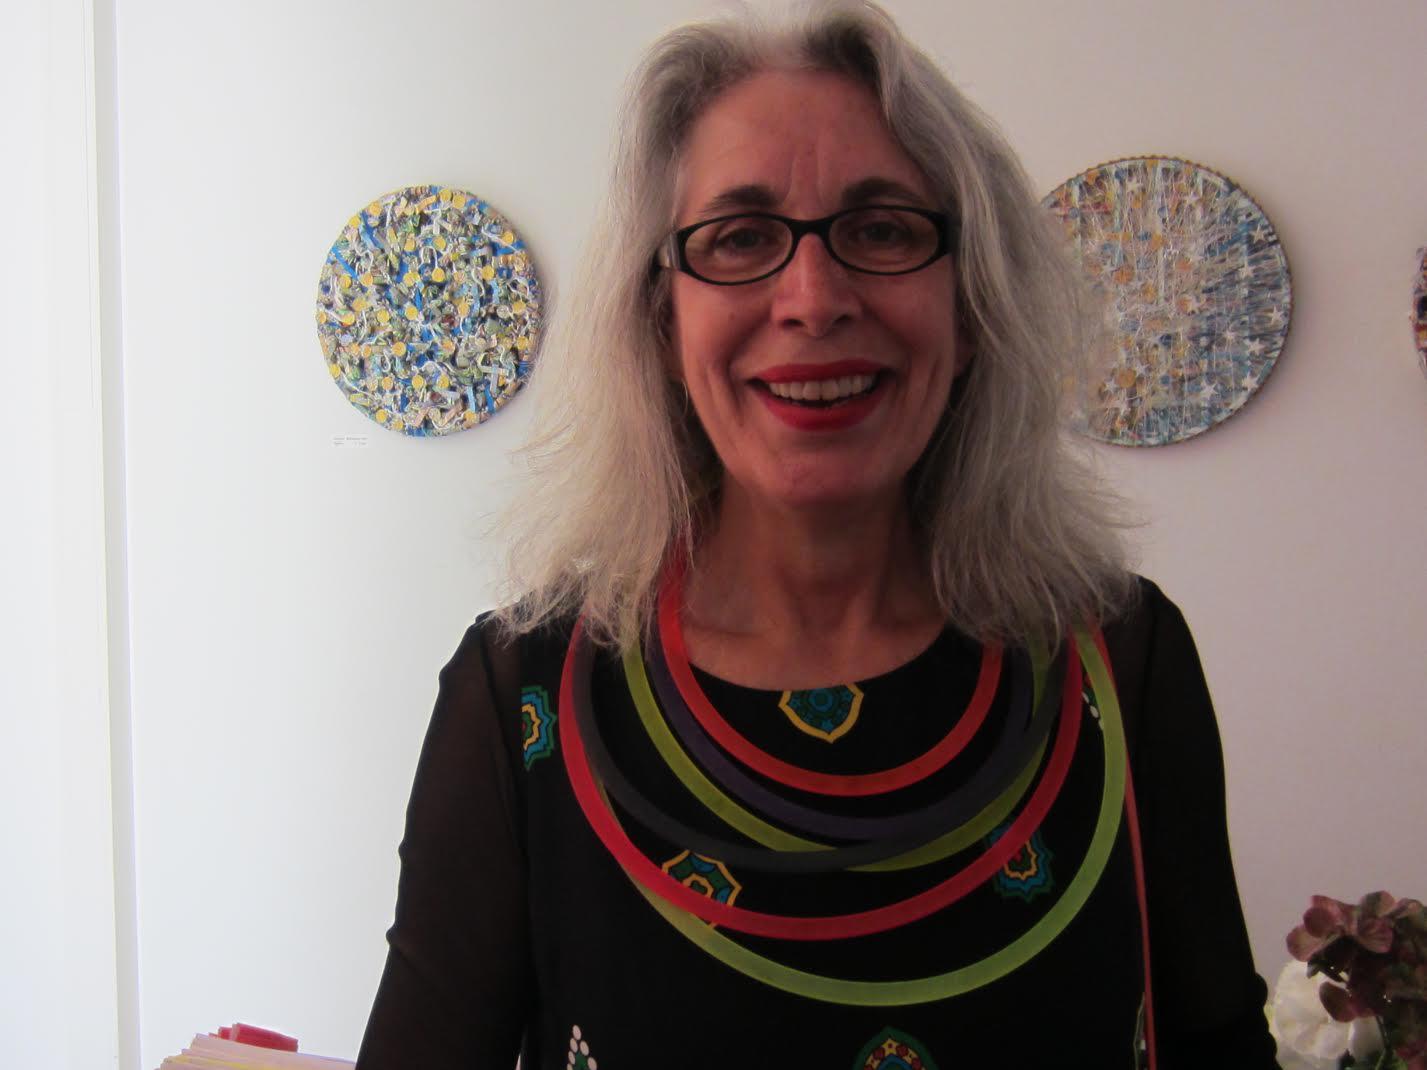 Thea Tolsma draagt halssieraad Paul Derrez, Galerie Ra, 20 mei 2017, portret, acryl